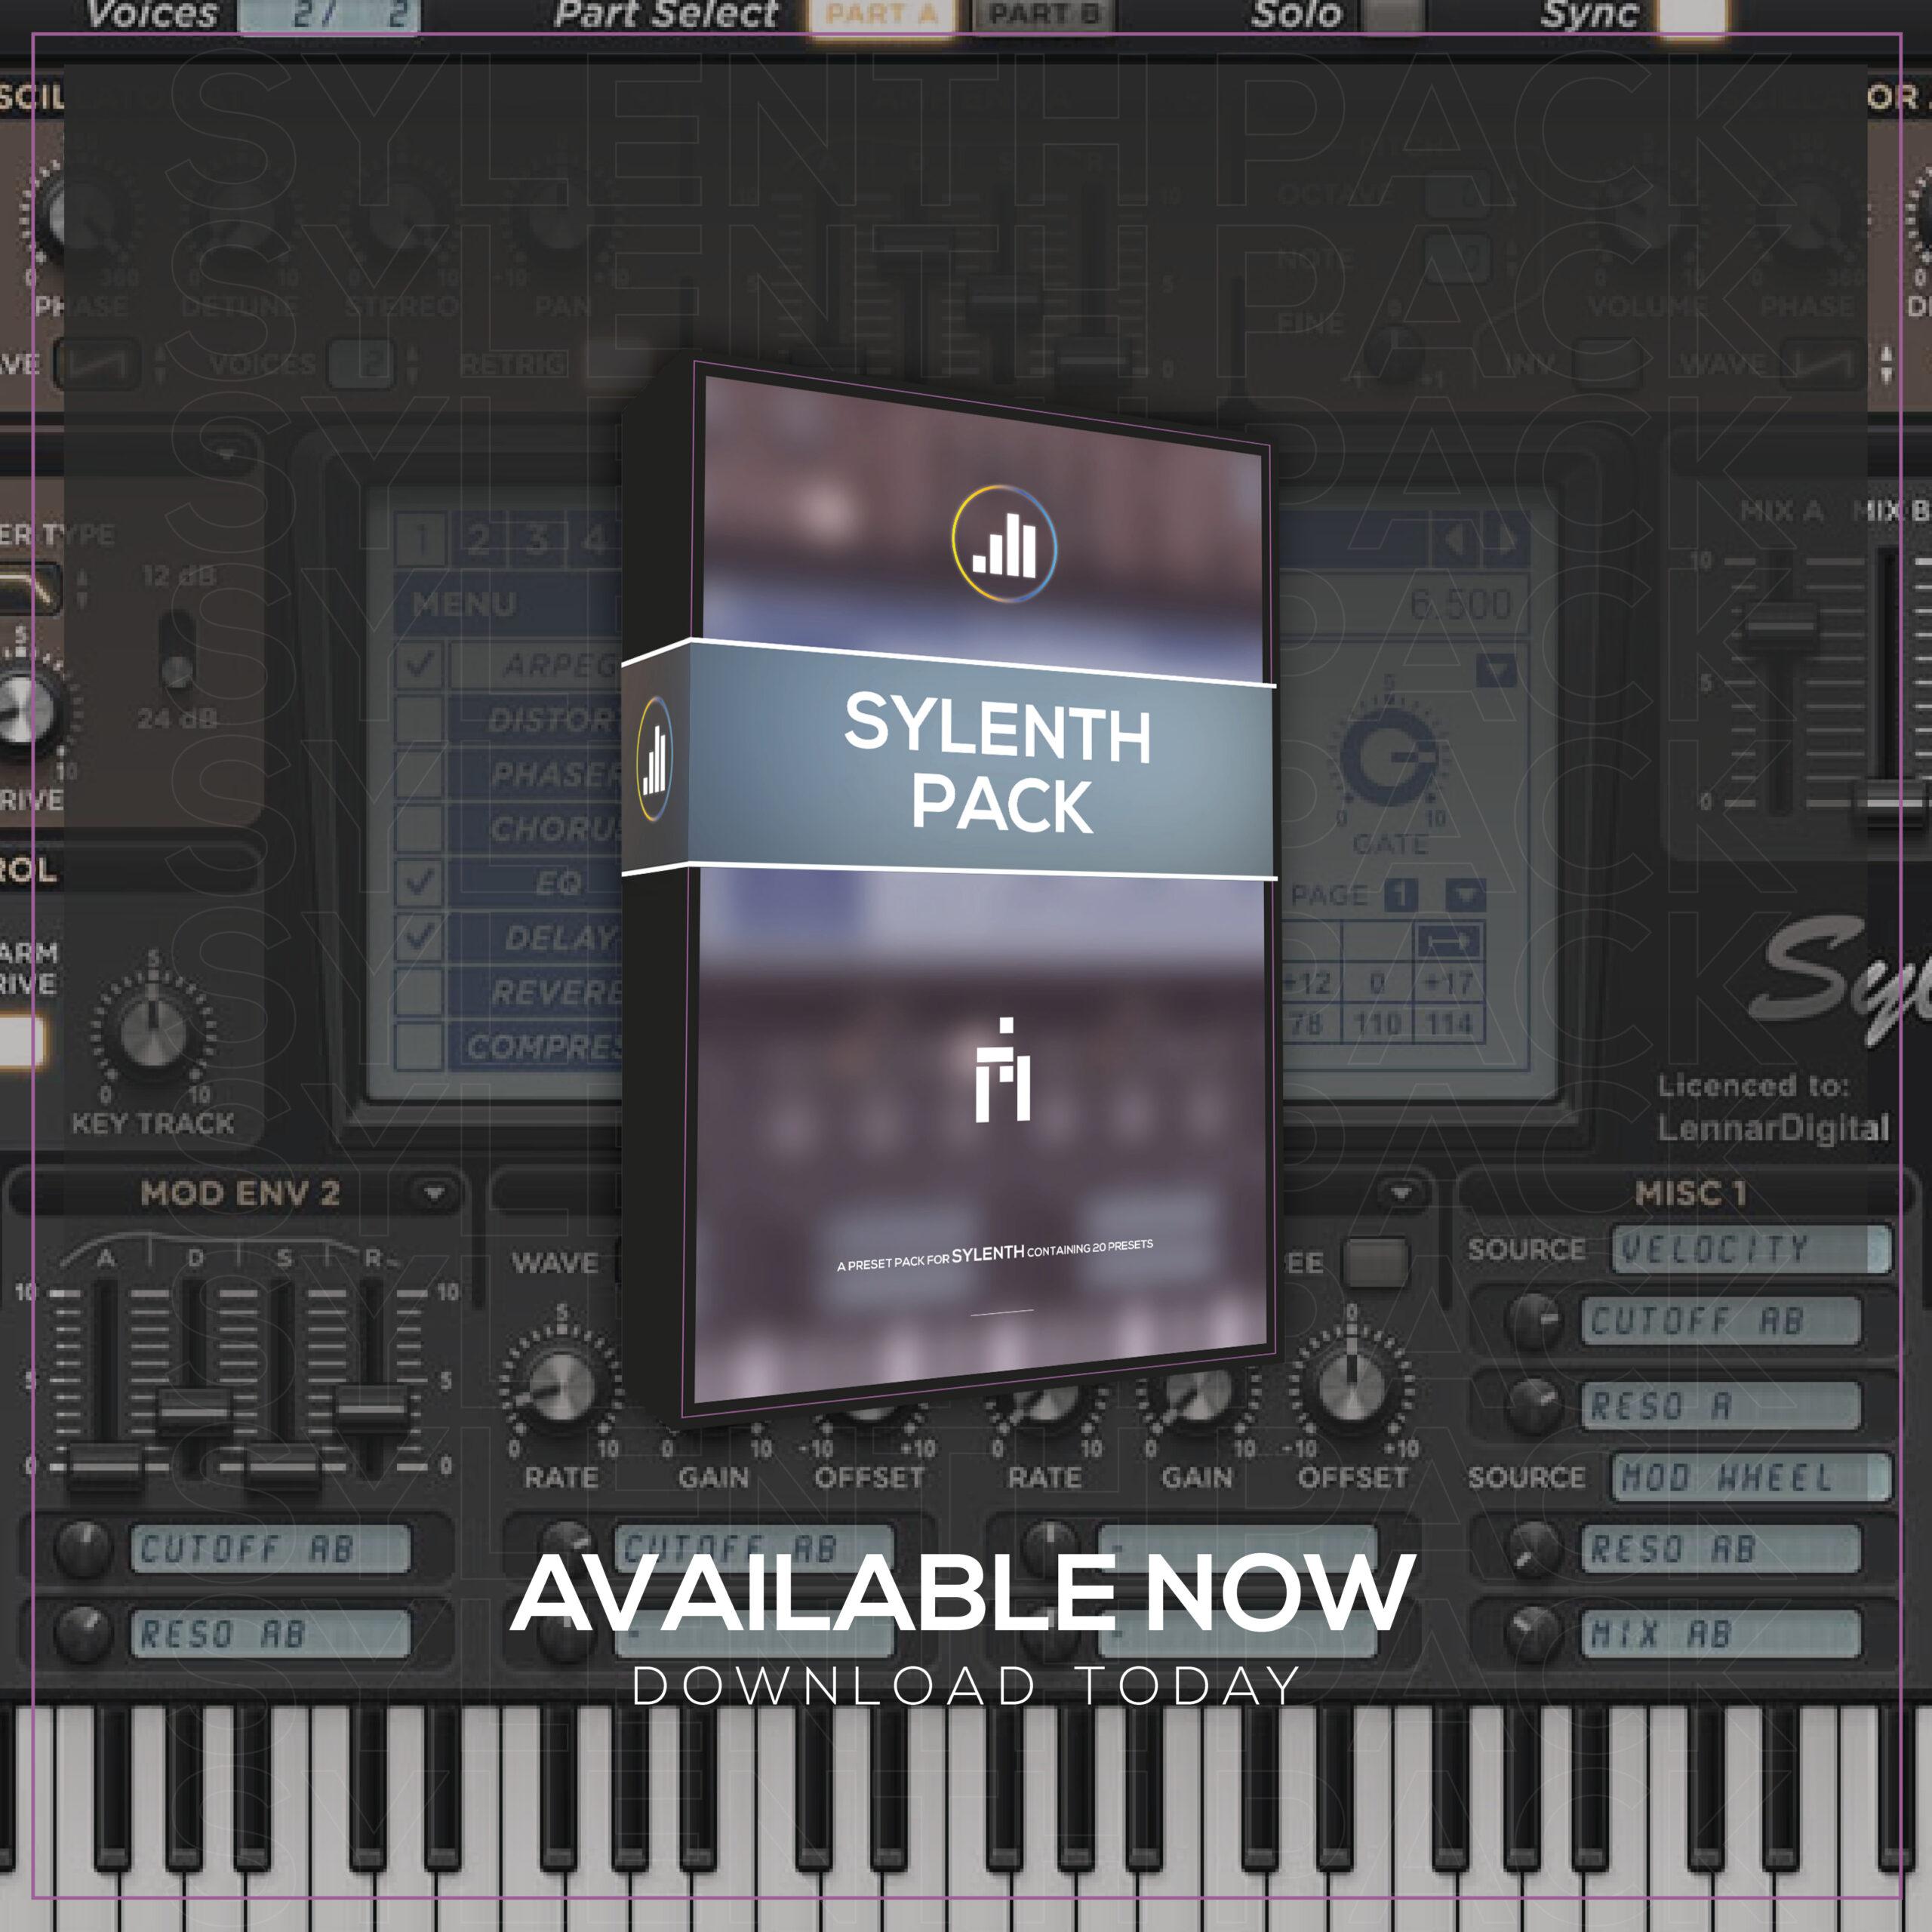 Sylenth Preset Pack